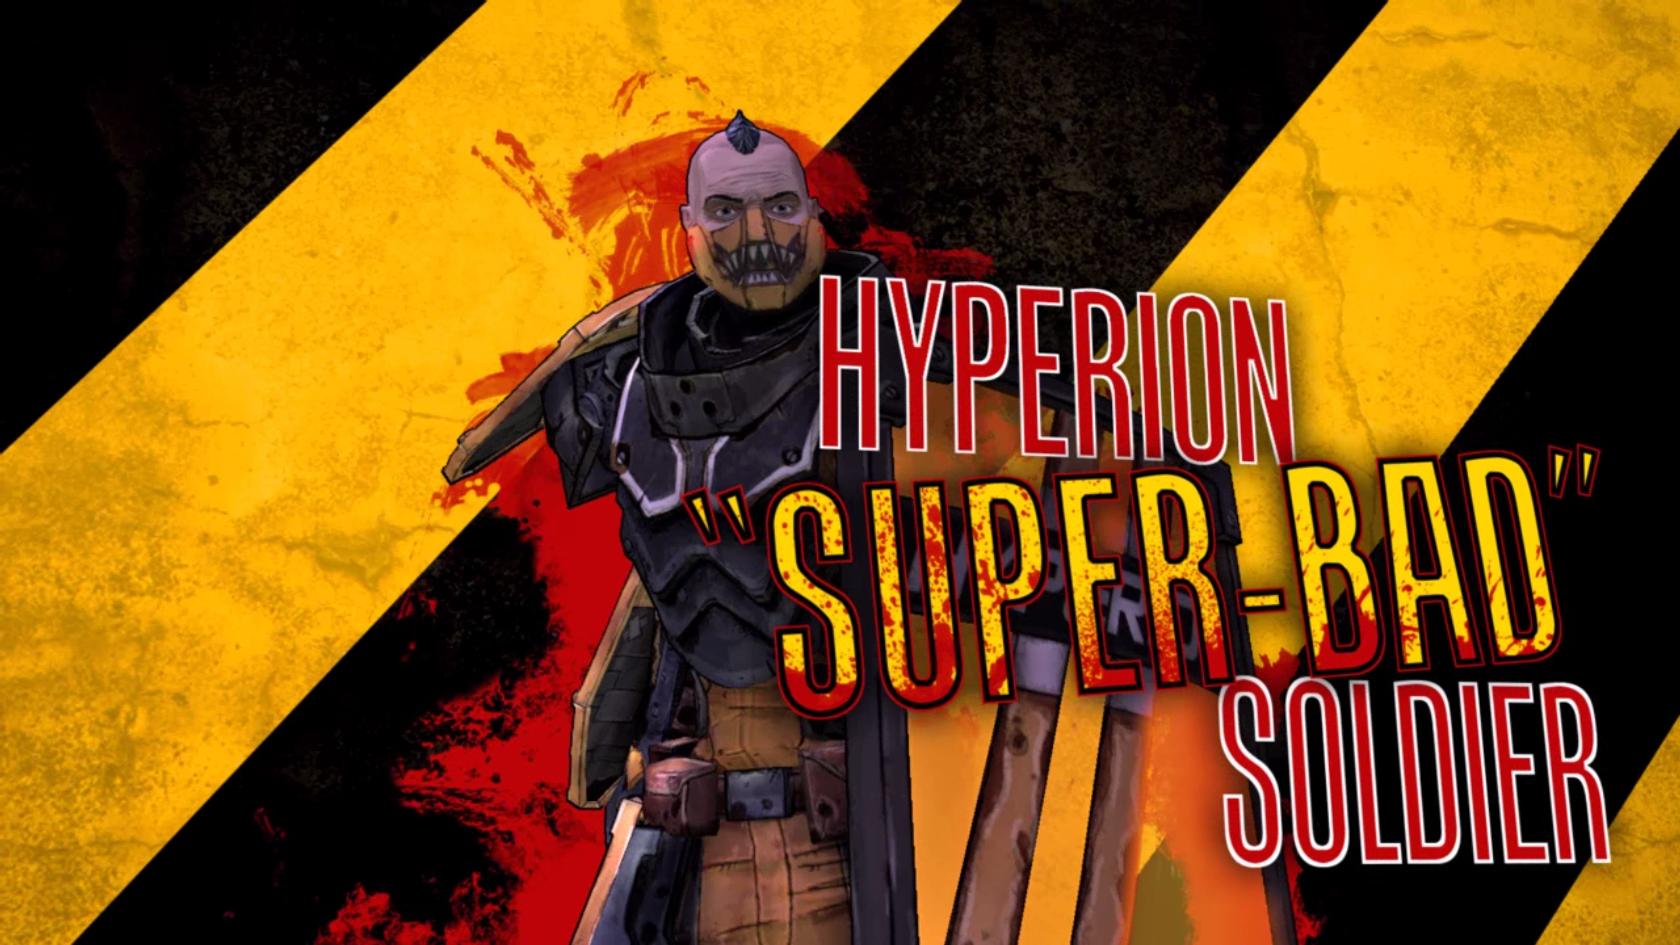 Hyperion 'Super-Bad' Soldier